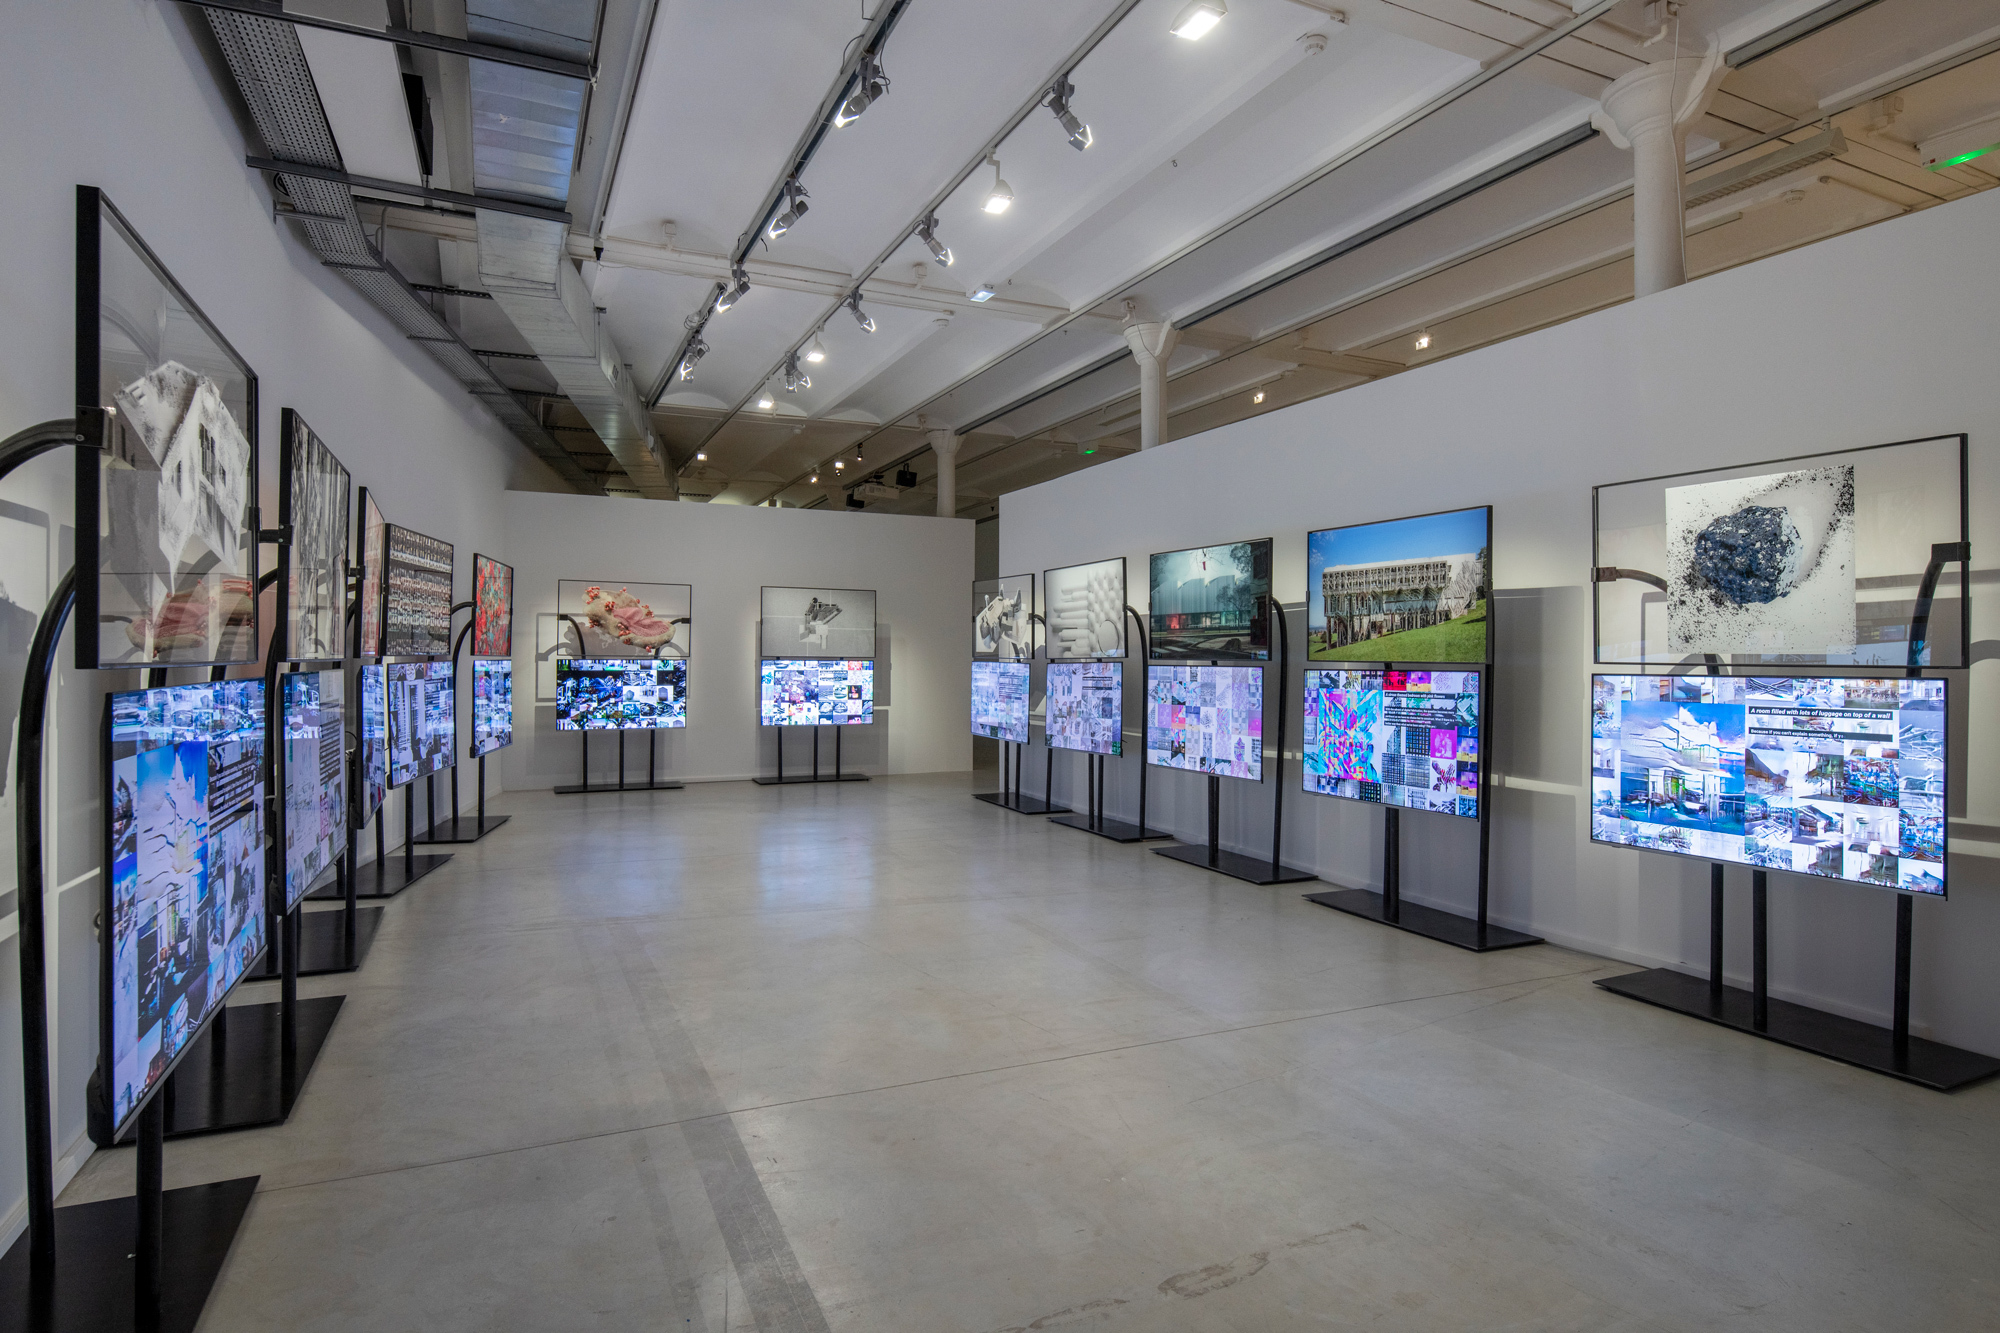 Addressing 'Solitude' in the Biennale d'Architecture d'Orléans at Frac Centre-Valde Loire